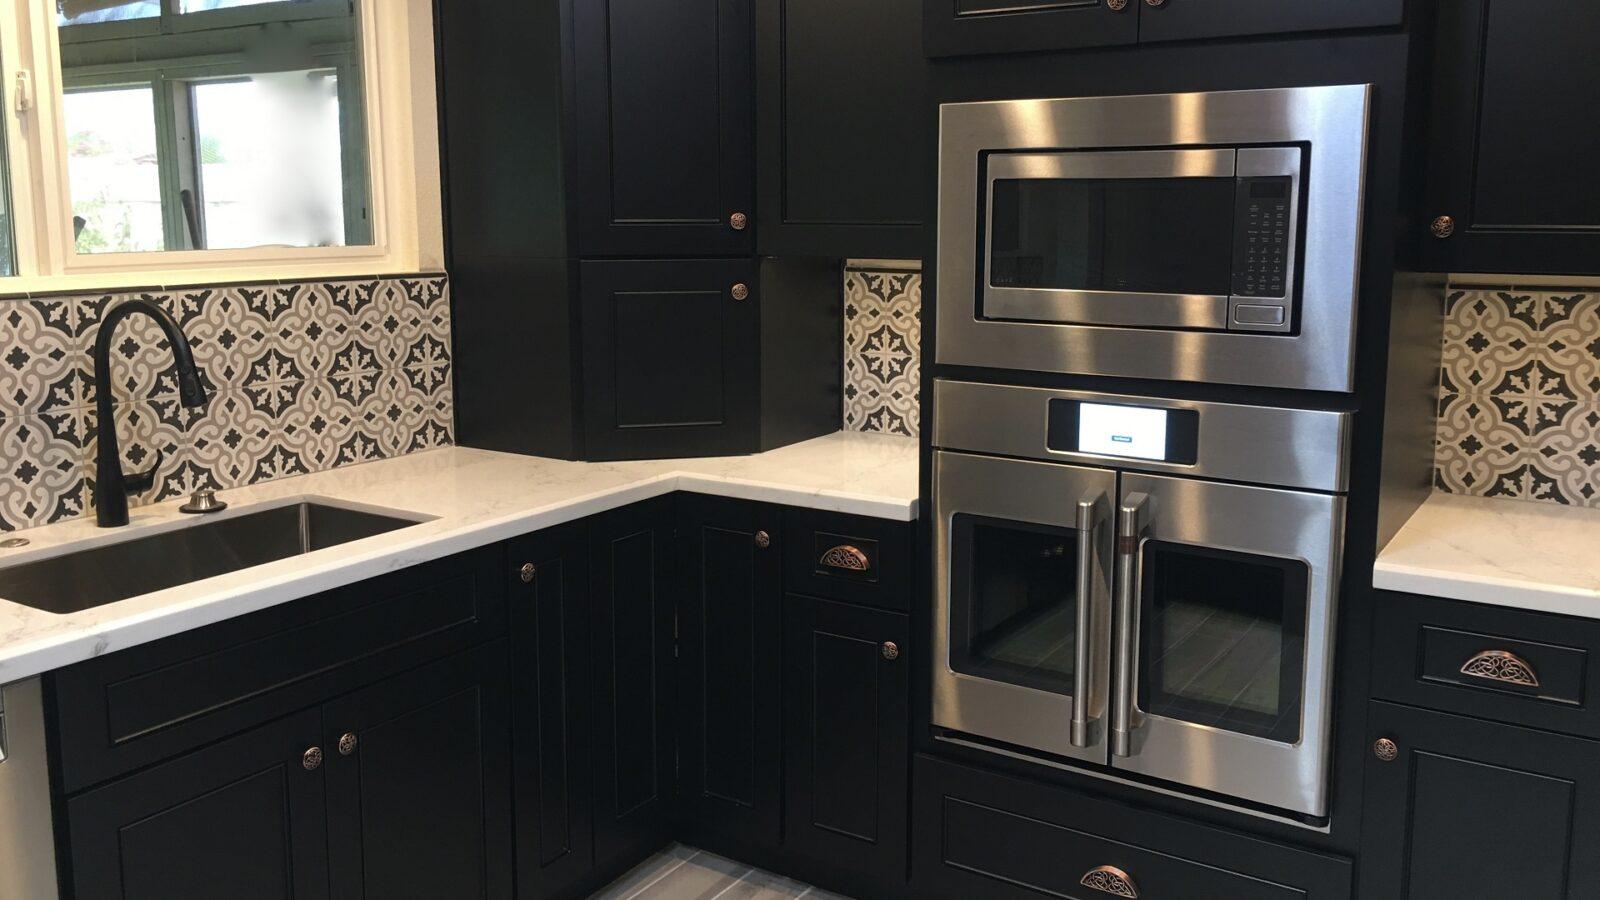 A black and copper kitchen